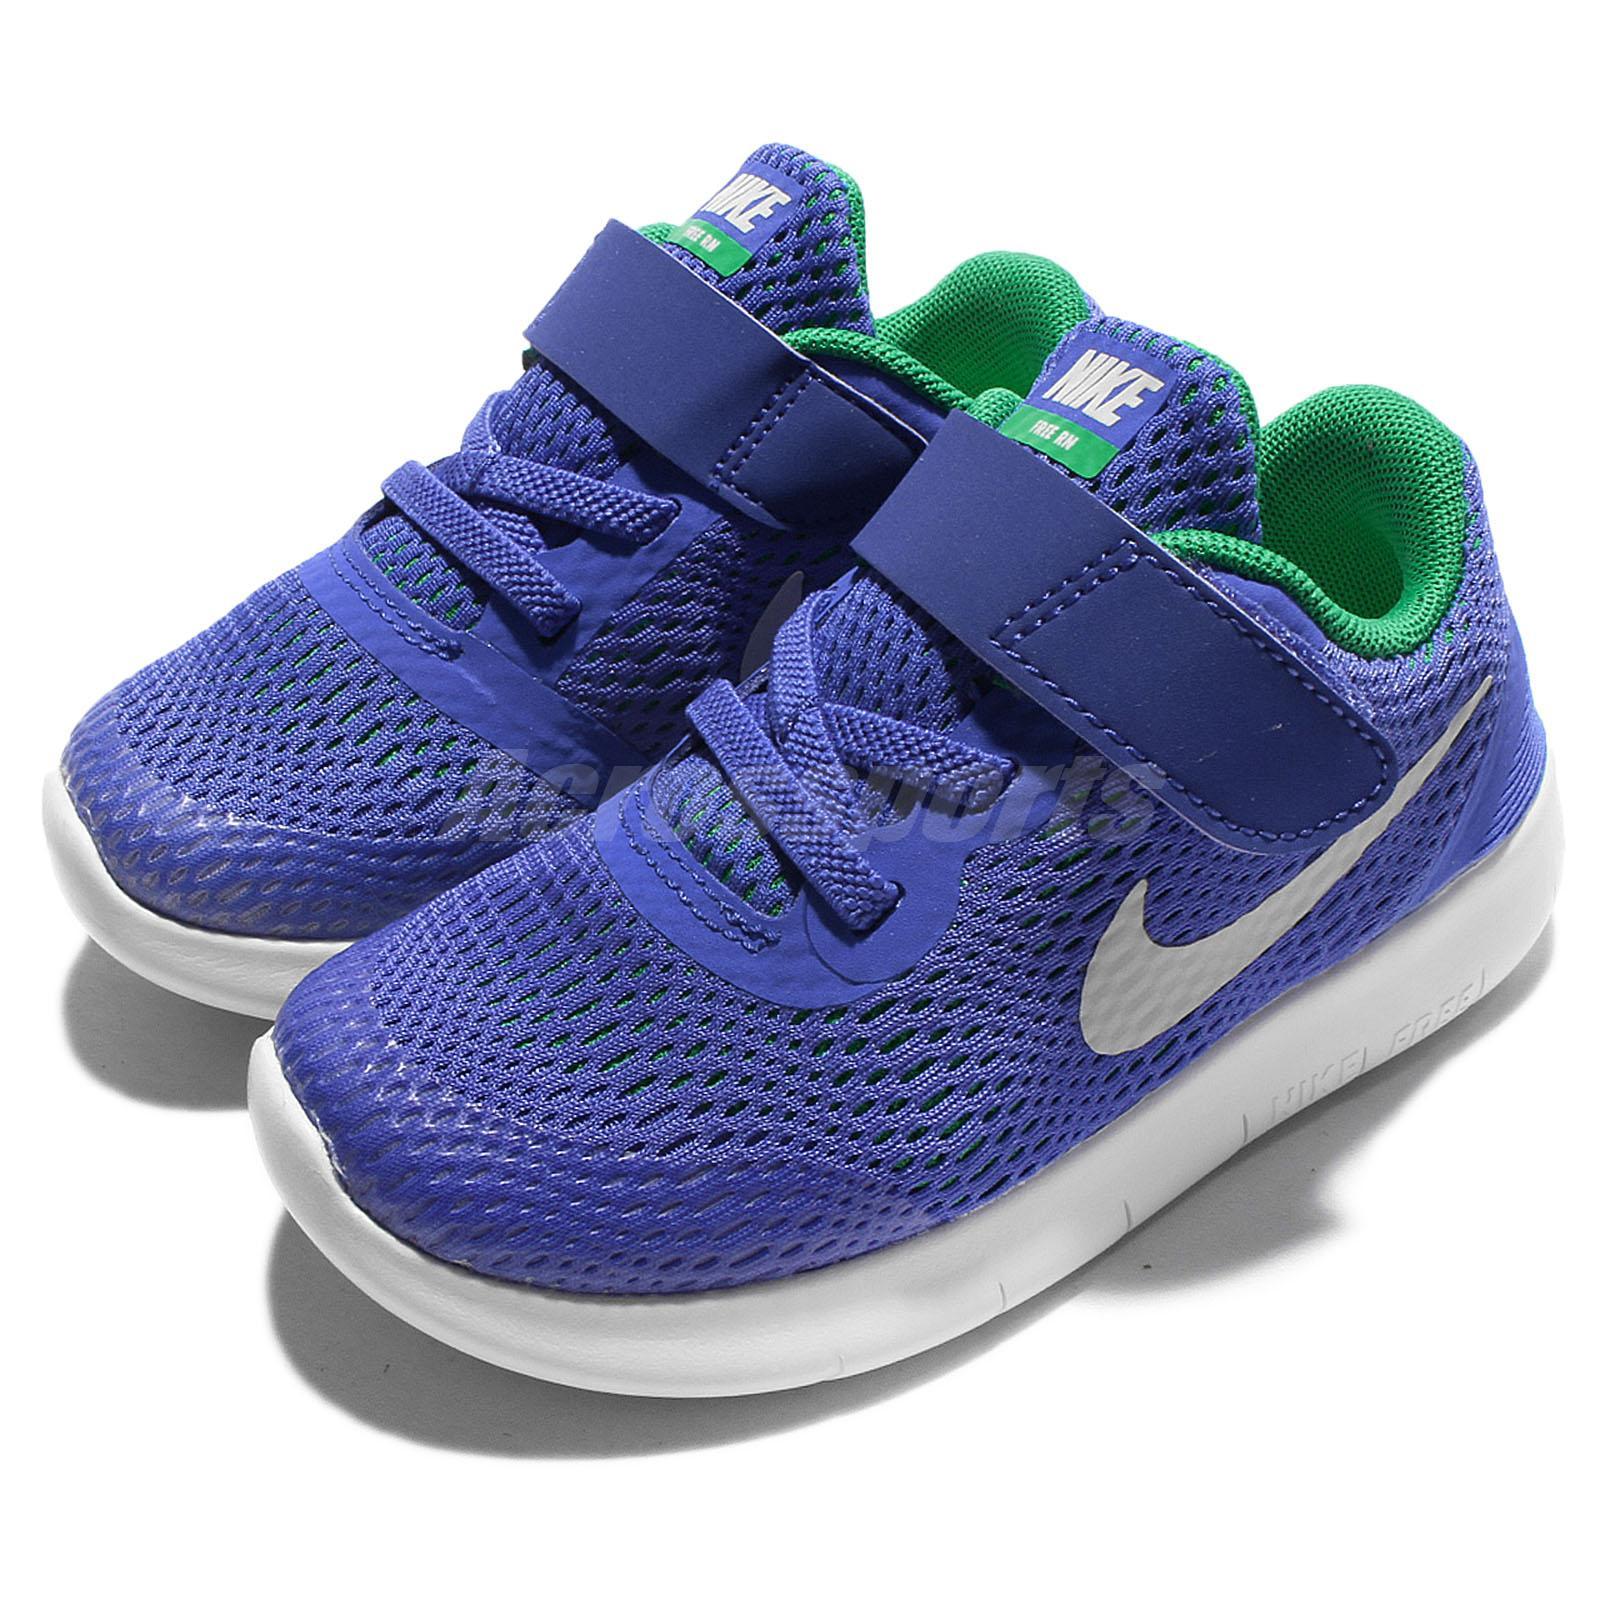 54d55b4cfa1d Details about Nike Free RN TDV Blue White Toddler Infant Shoes Prewalkers  Sneakers 833992-404